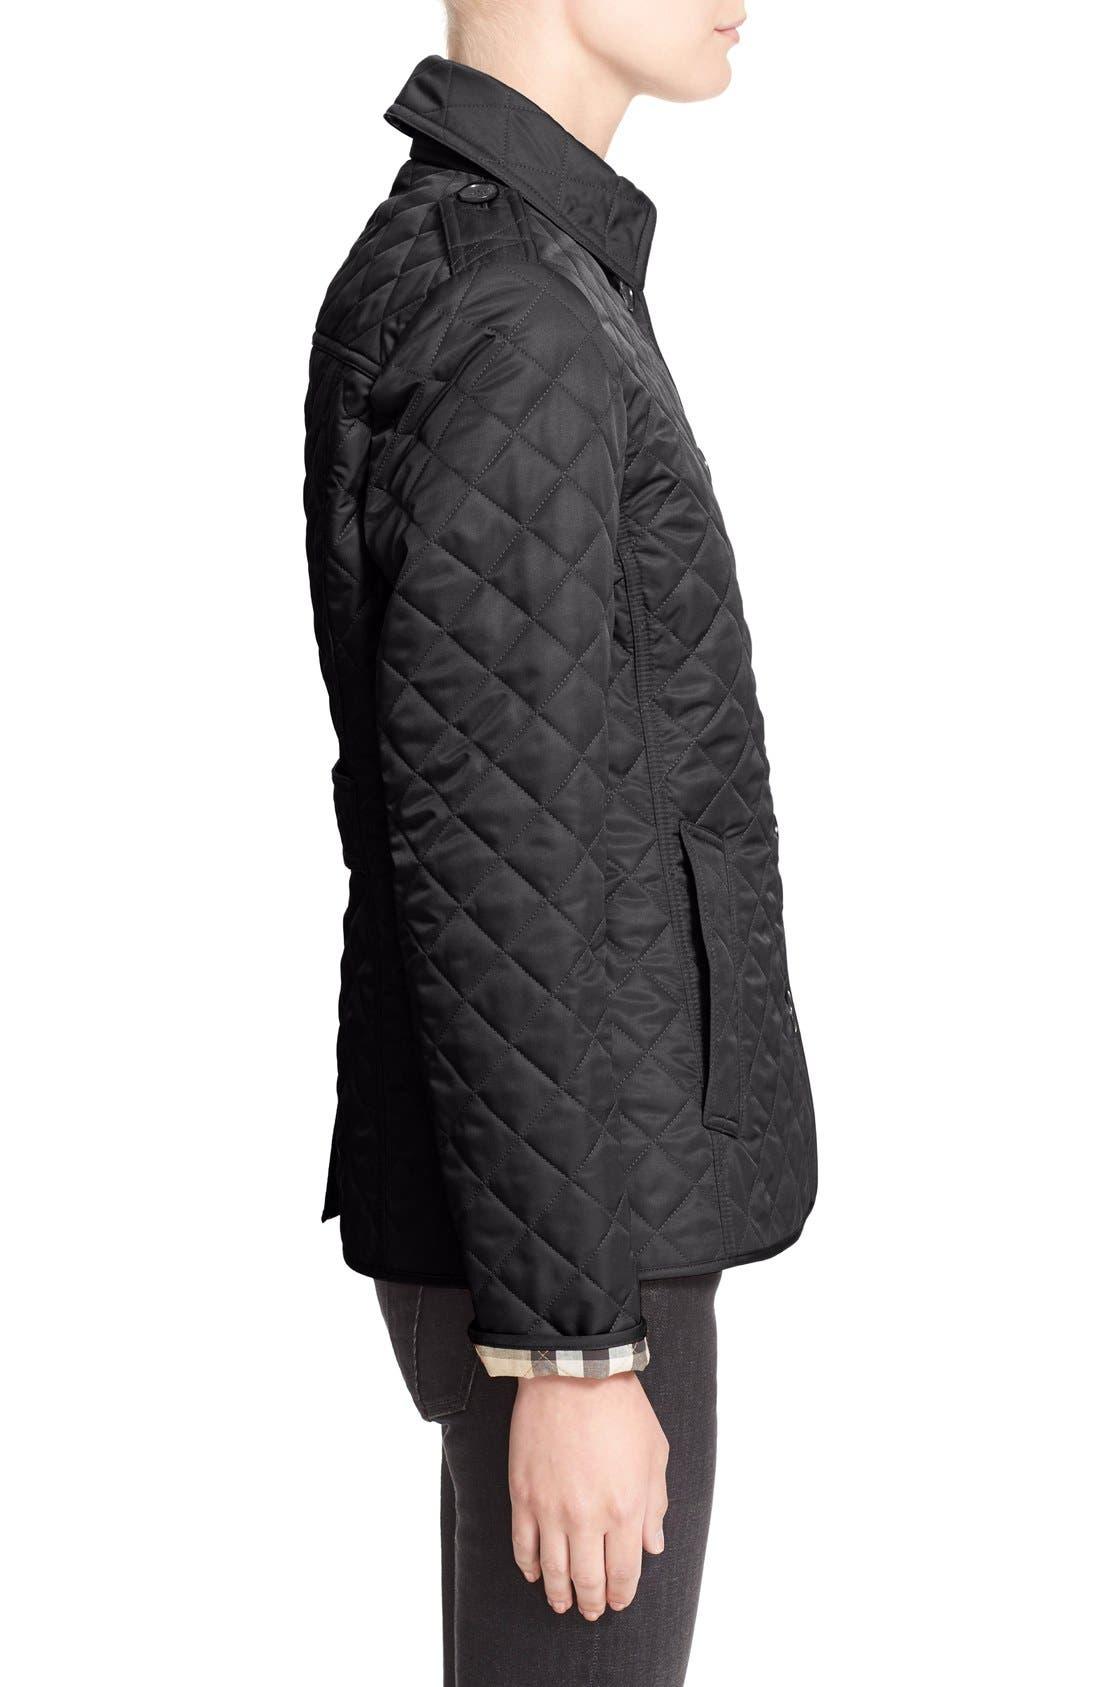 Ashurst Quilted Jacket,                             Alternate thumbnail 11, color,                             BLACK